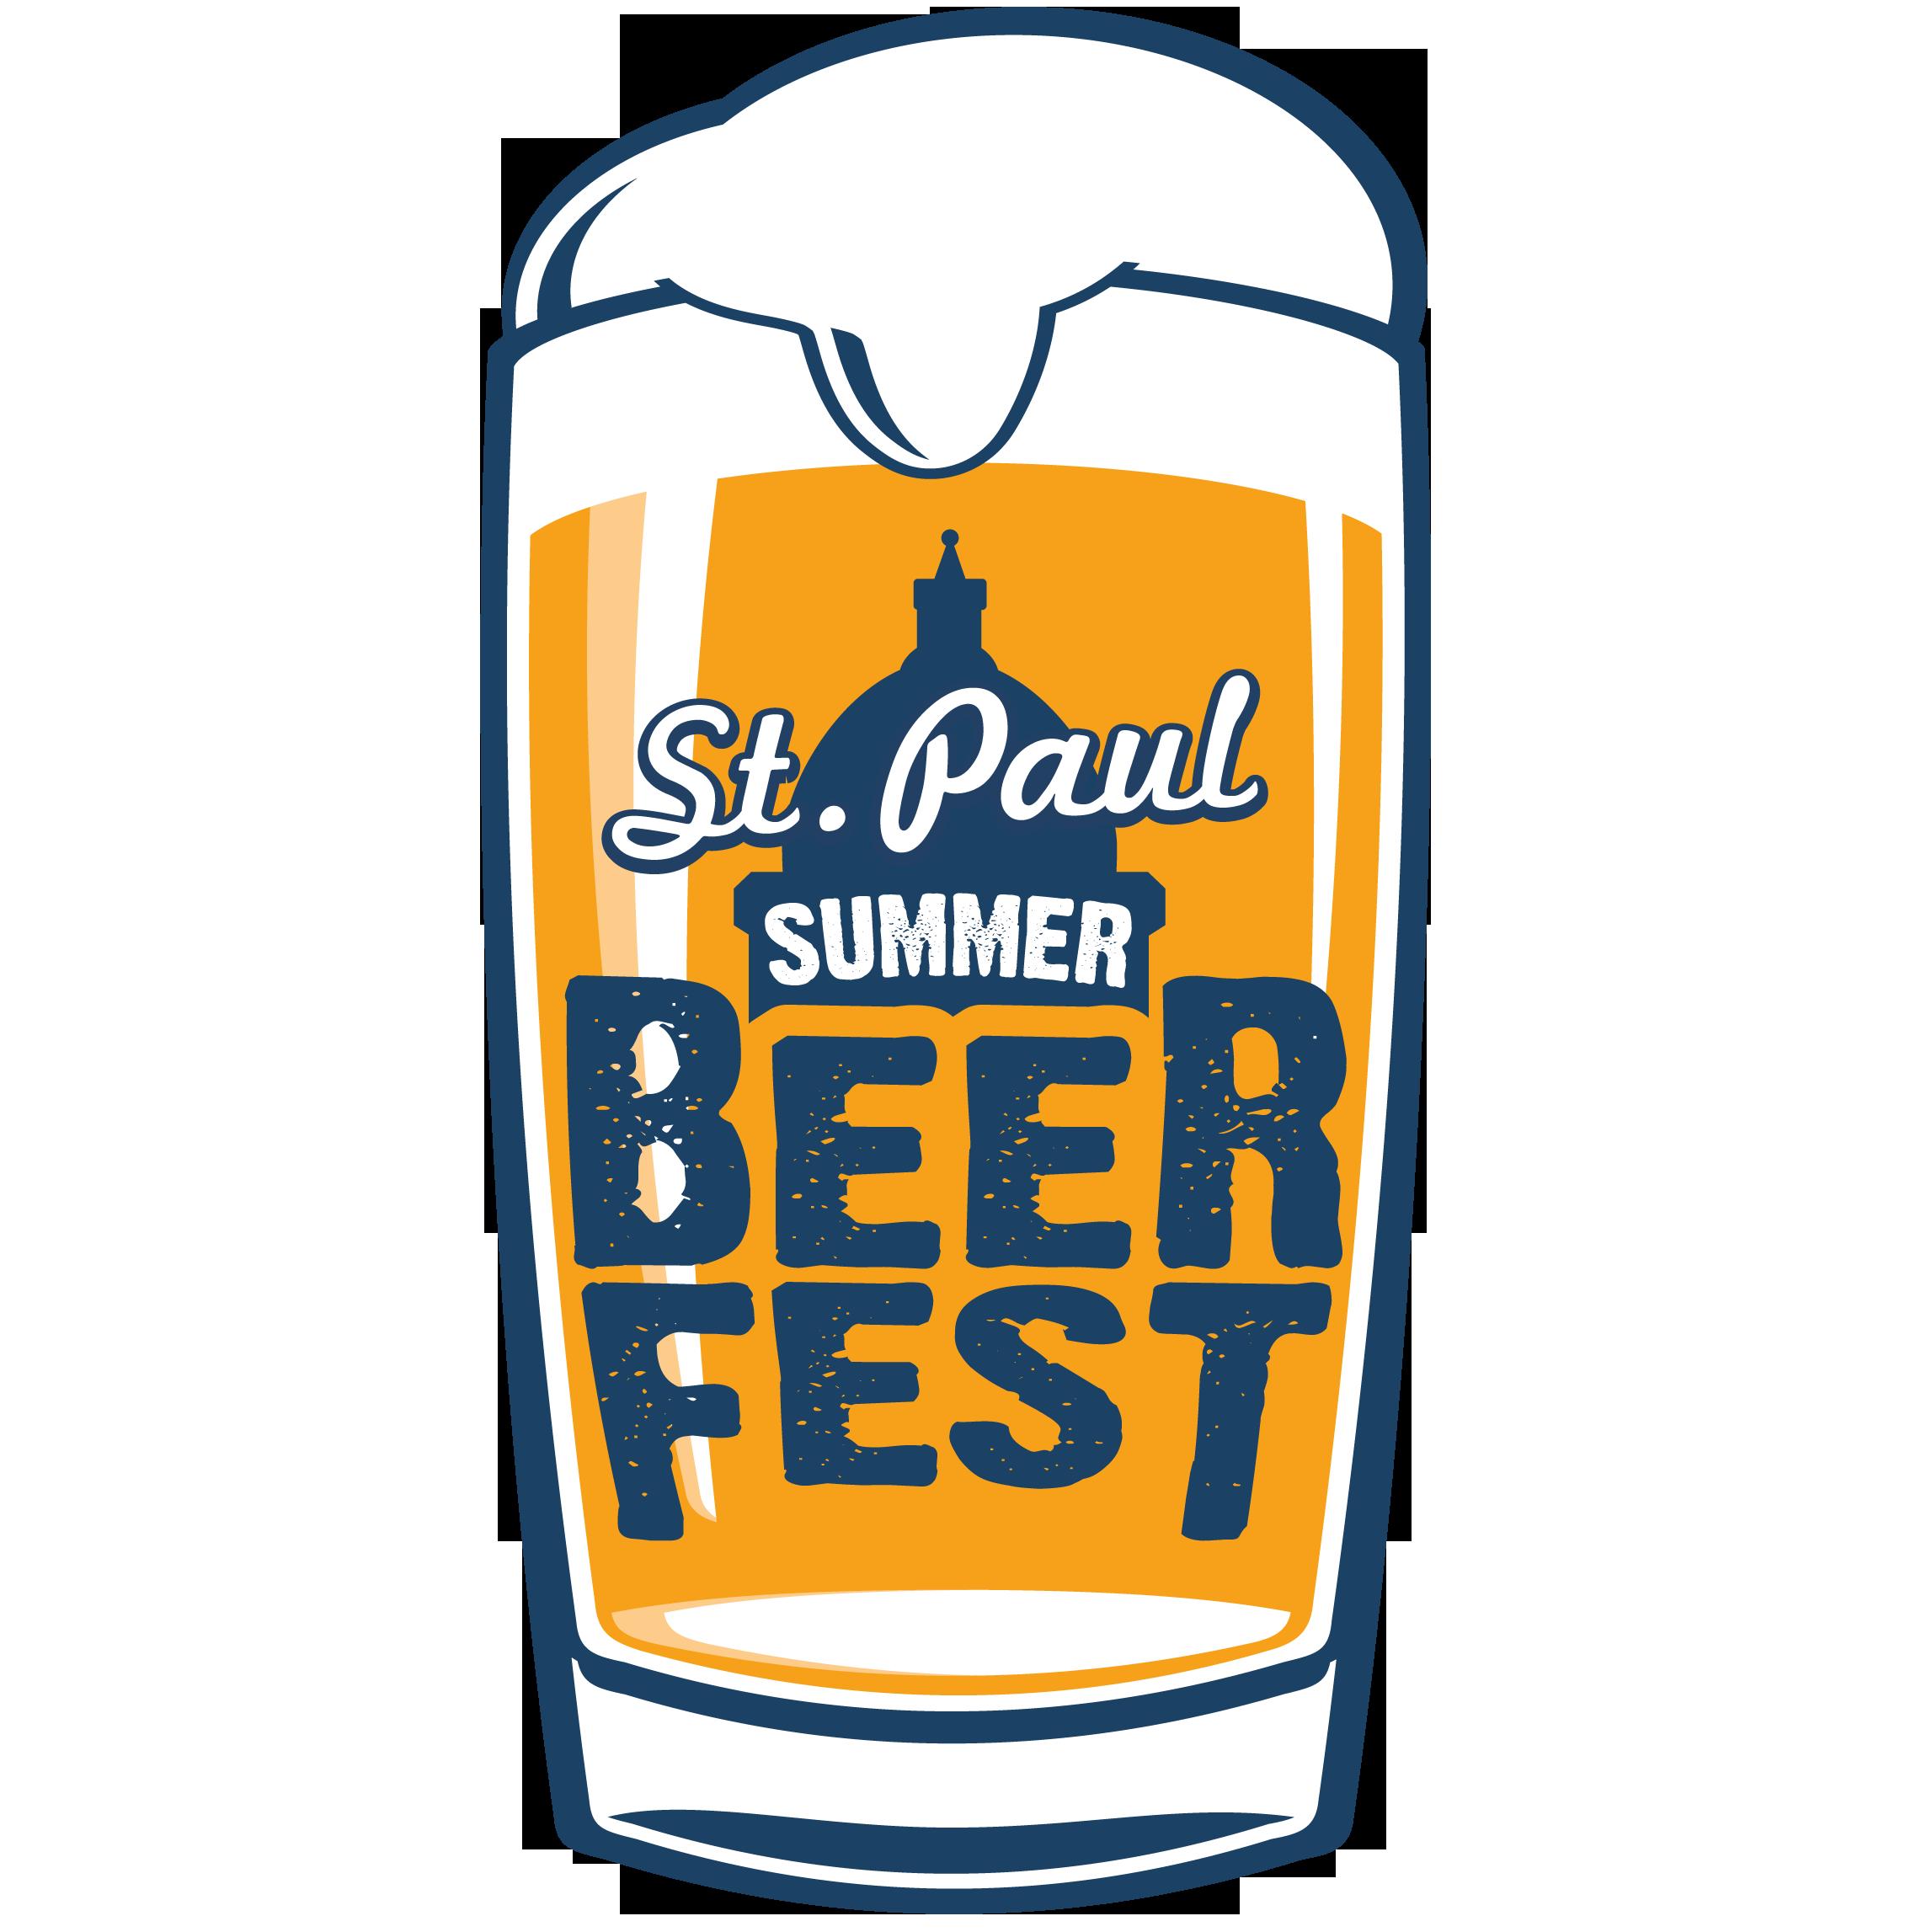 St Paul Summer Beer Fest - Win 'em Before You Can Buy 'em